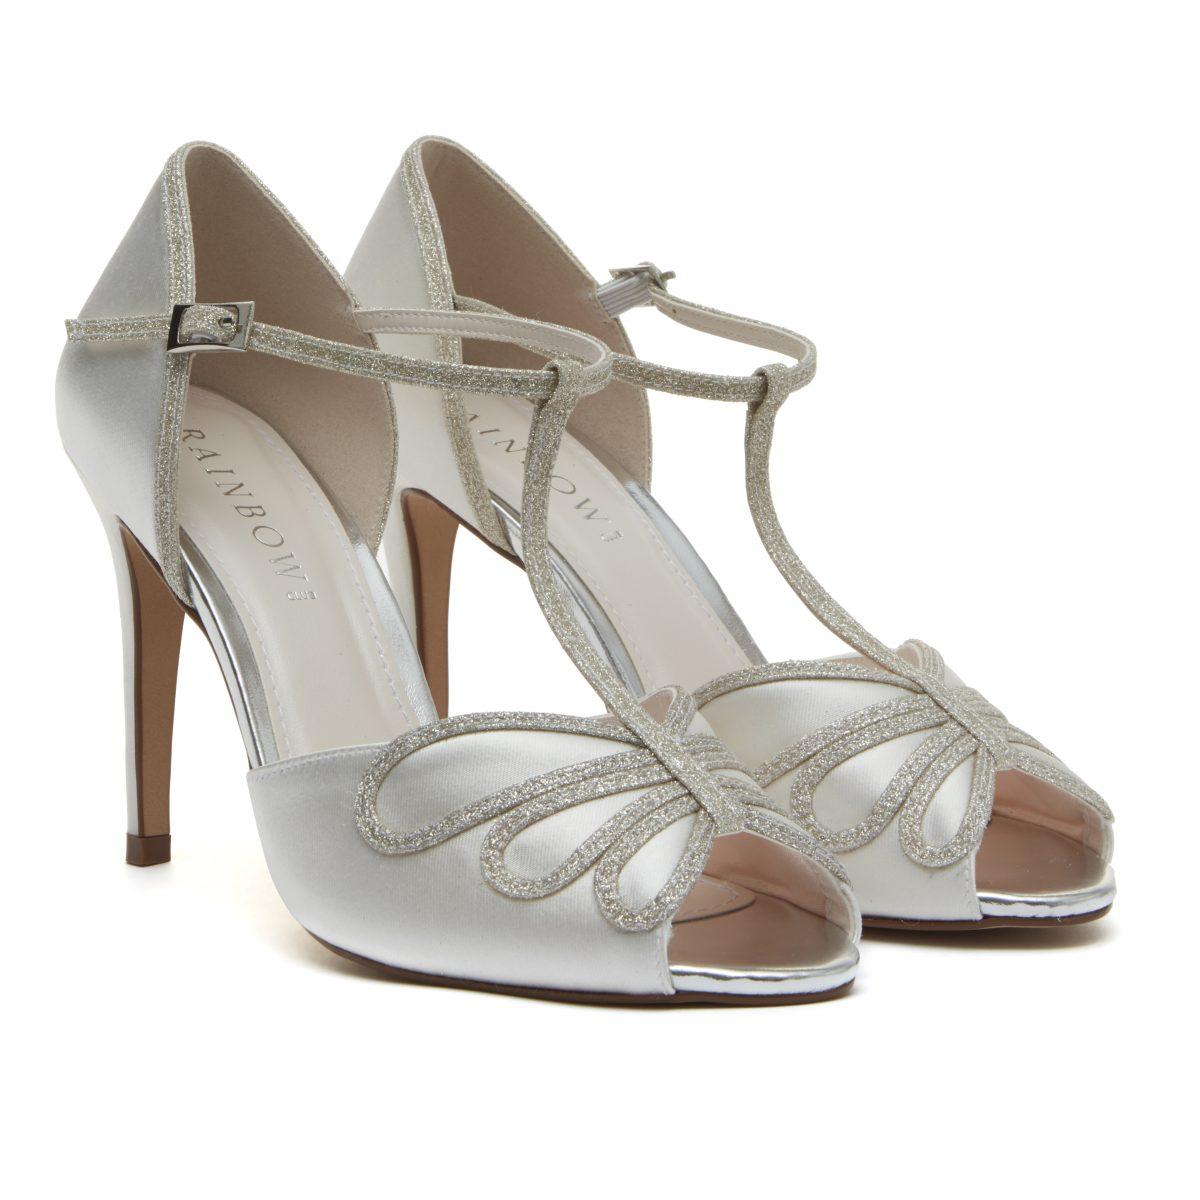 Rainbow Club Luciana - Peep Toe Satin/ Silver Shimmer Shoe 1